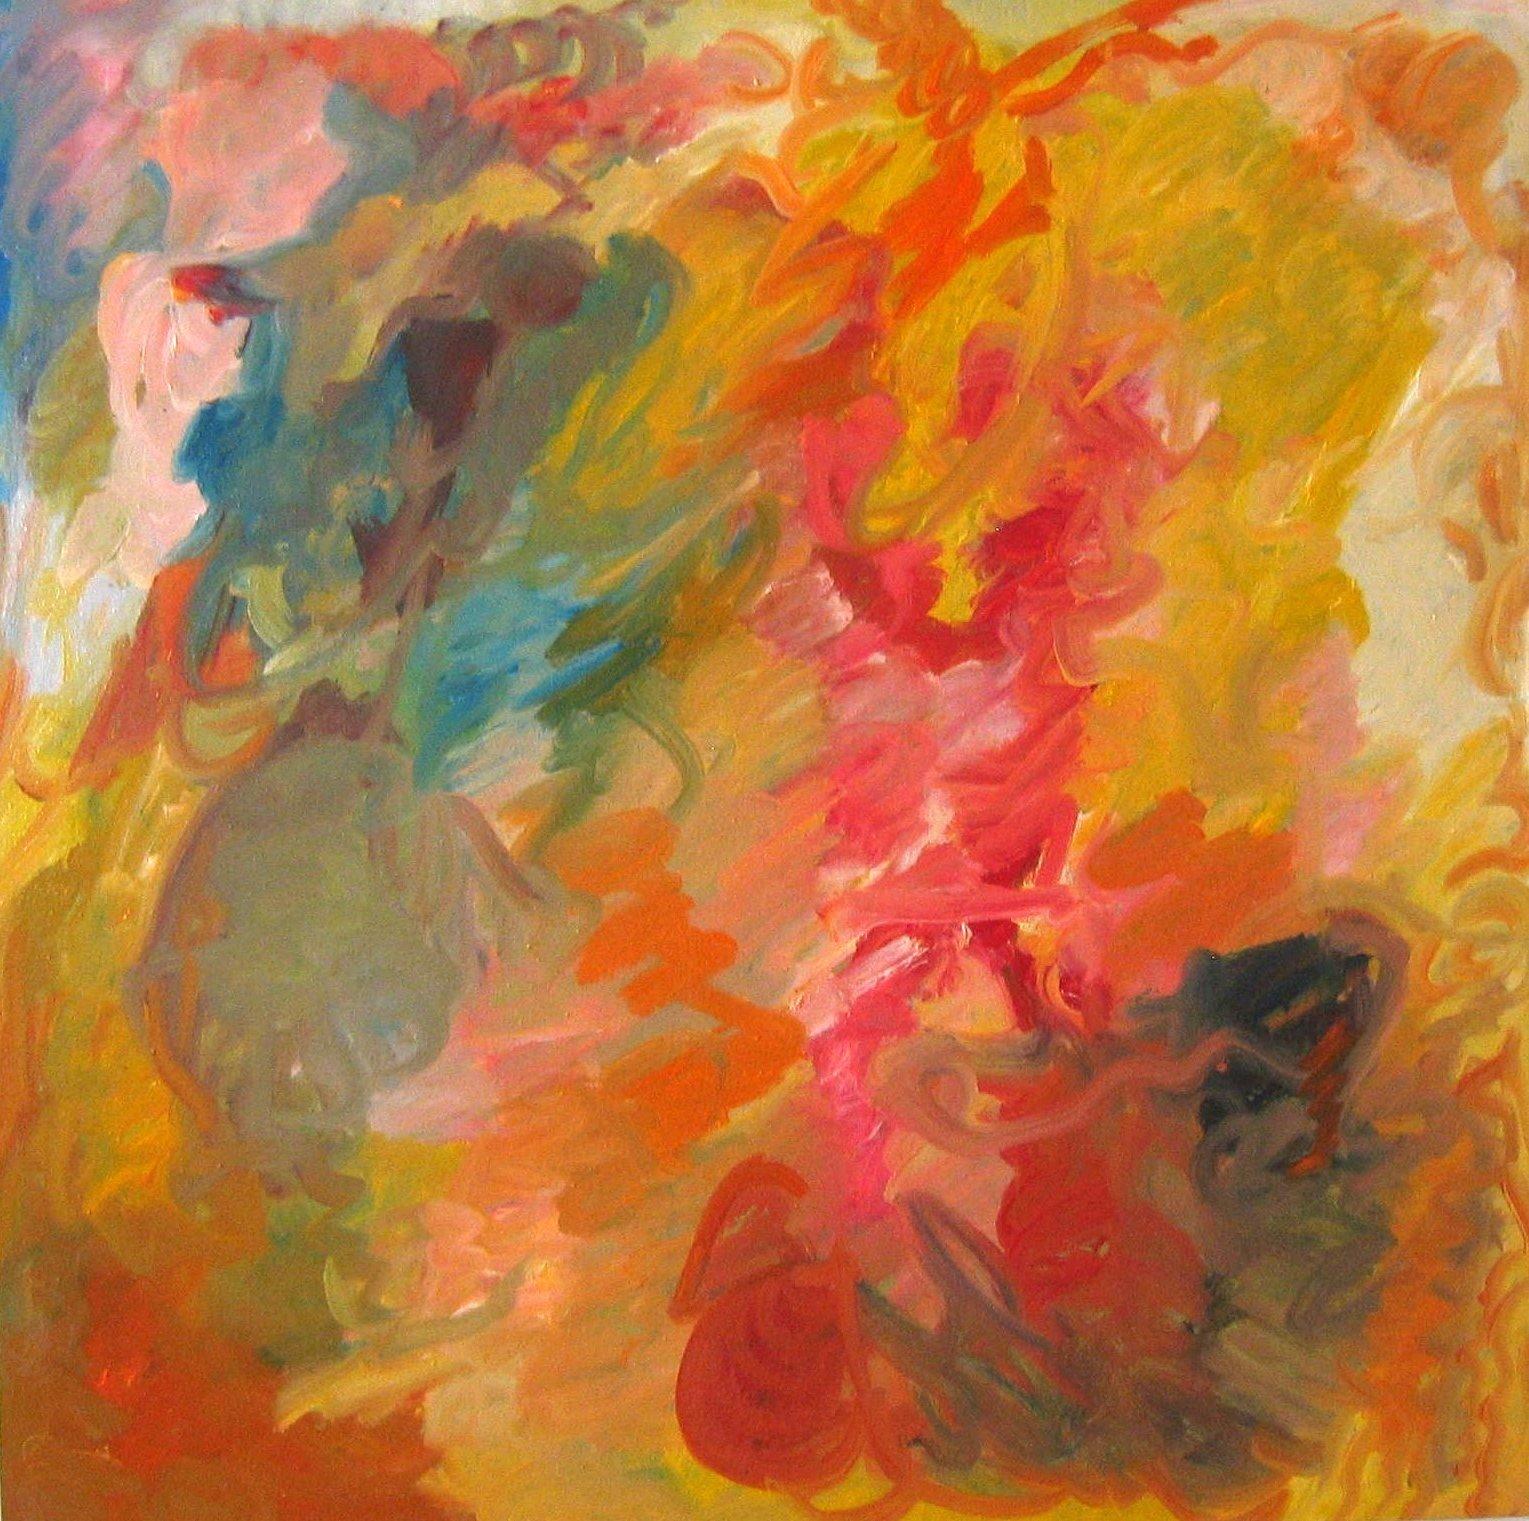 Conversation (2010)